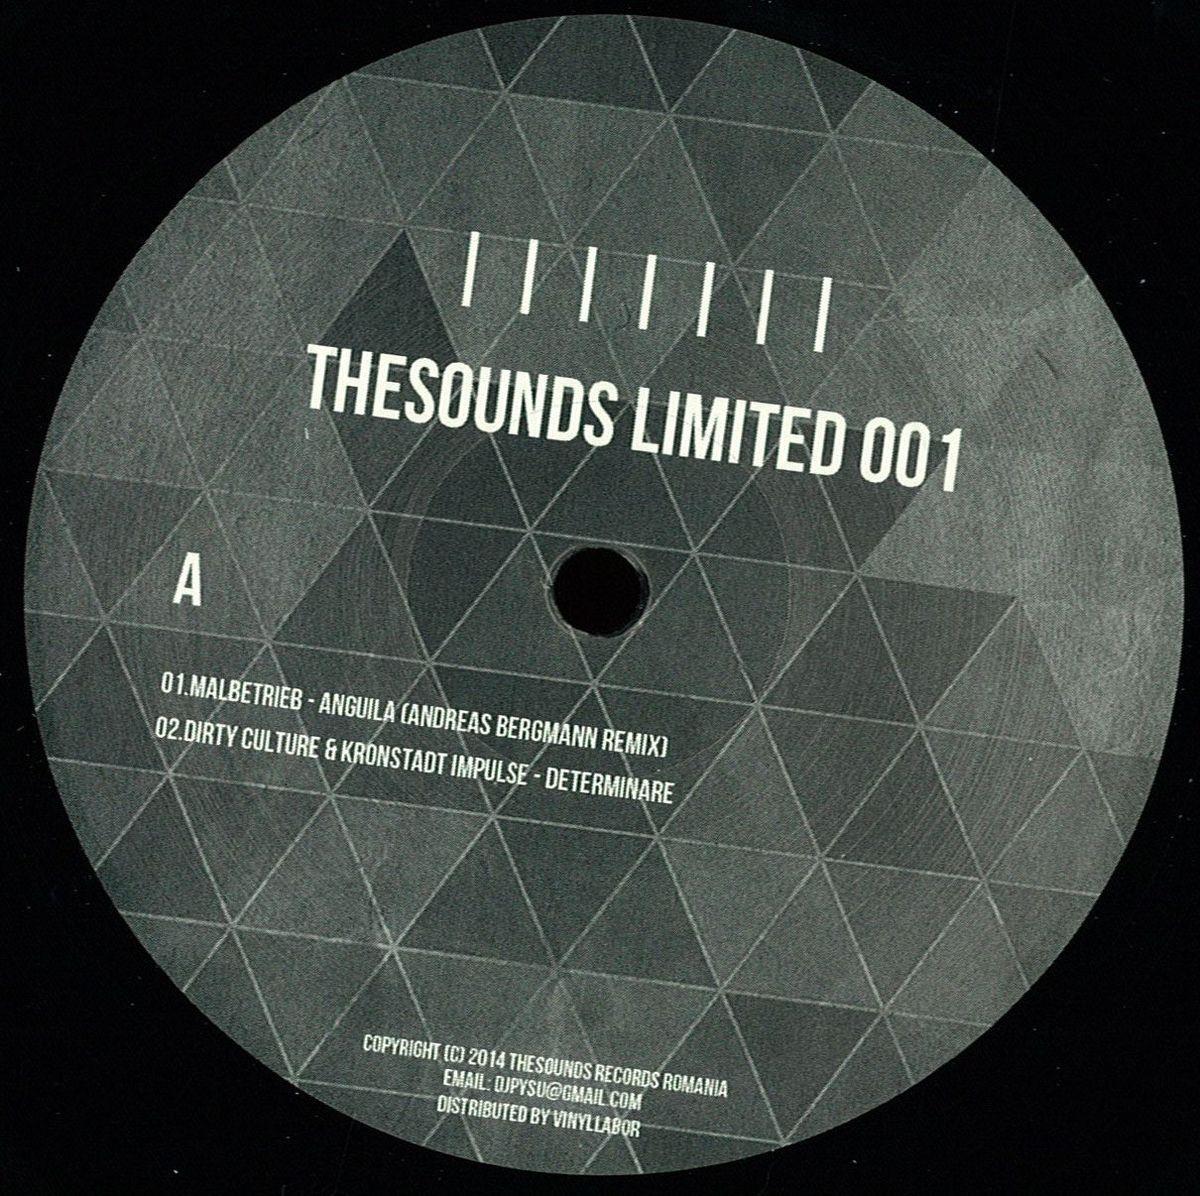 "TheSounds Limited Vinyl 12"" - Malbetrieb / Andreas Bergmann / Rhadow / Mario Aureo / Nusha / Dirty Culture / Kronstadt Impulse http://www.deejay.de/Various_Artists-Thesounds_Limited_001__140603"